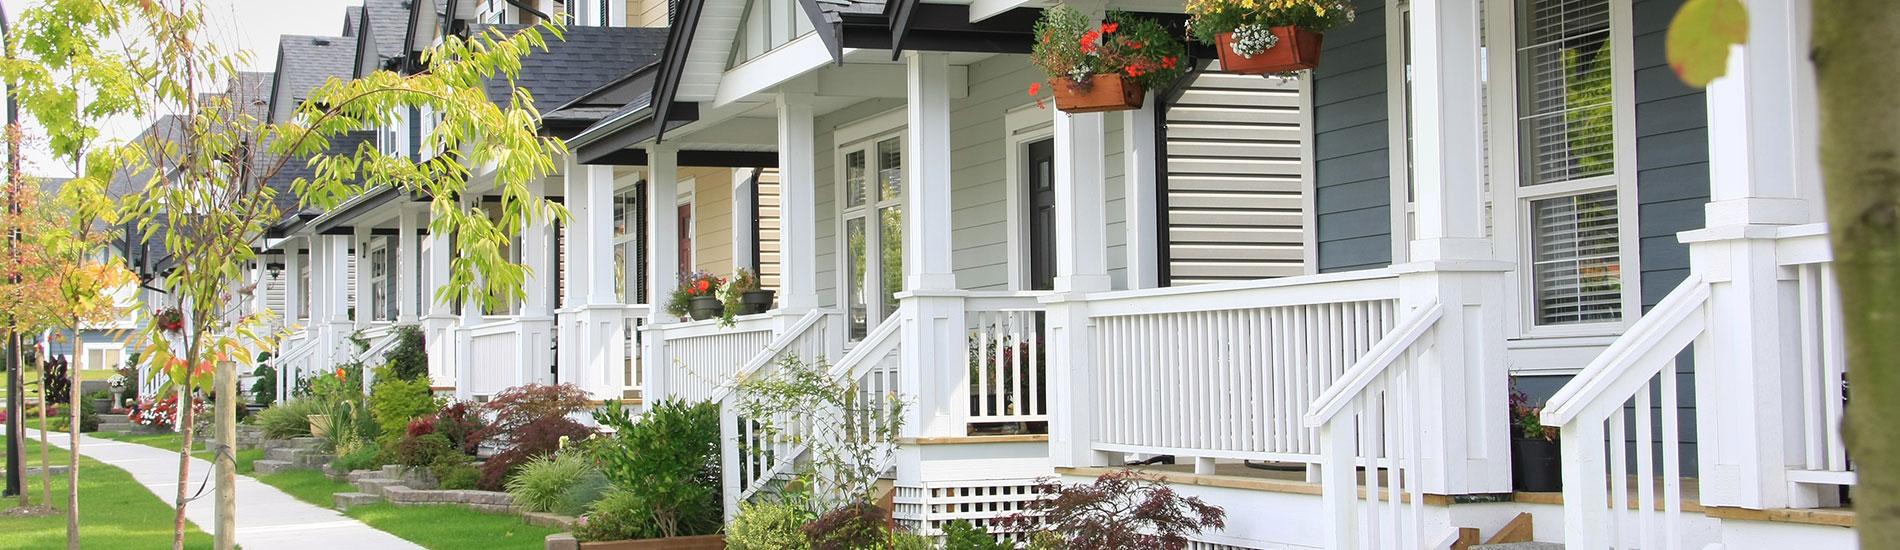 Renters Insurance in Monroe GA, Bogart GA, Loganville